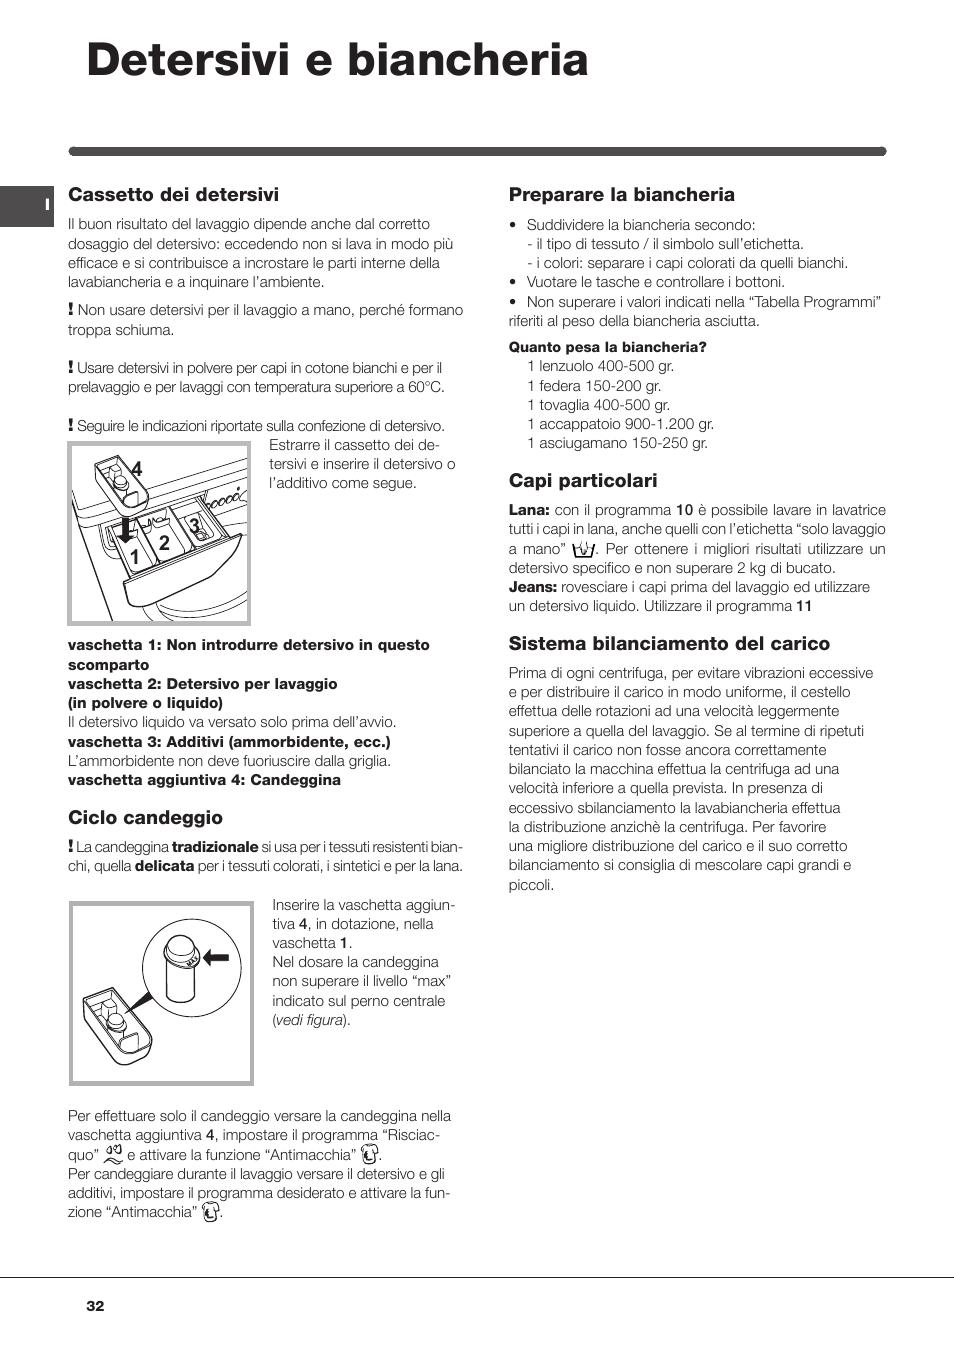 detersivi e biancheria   indesit iwc-81051-c-eco(eu) user manual